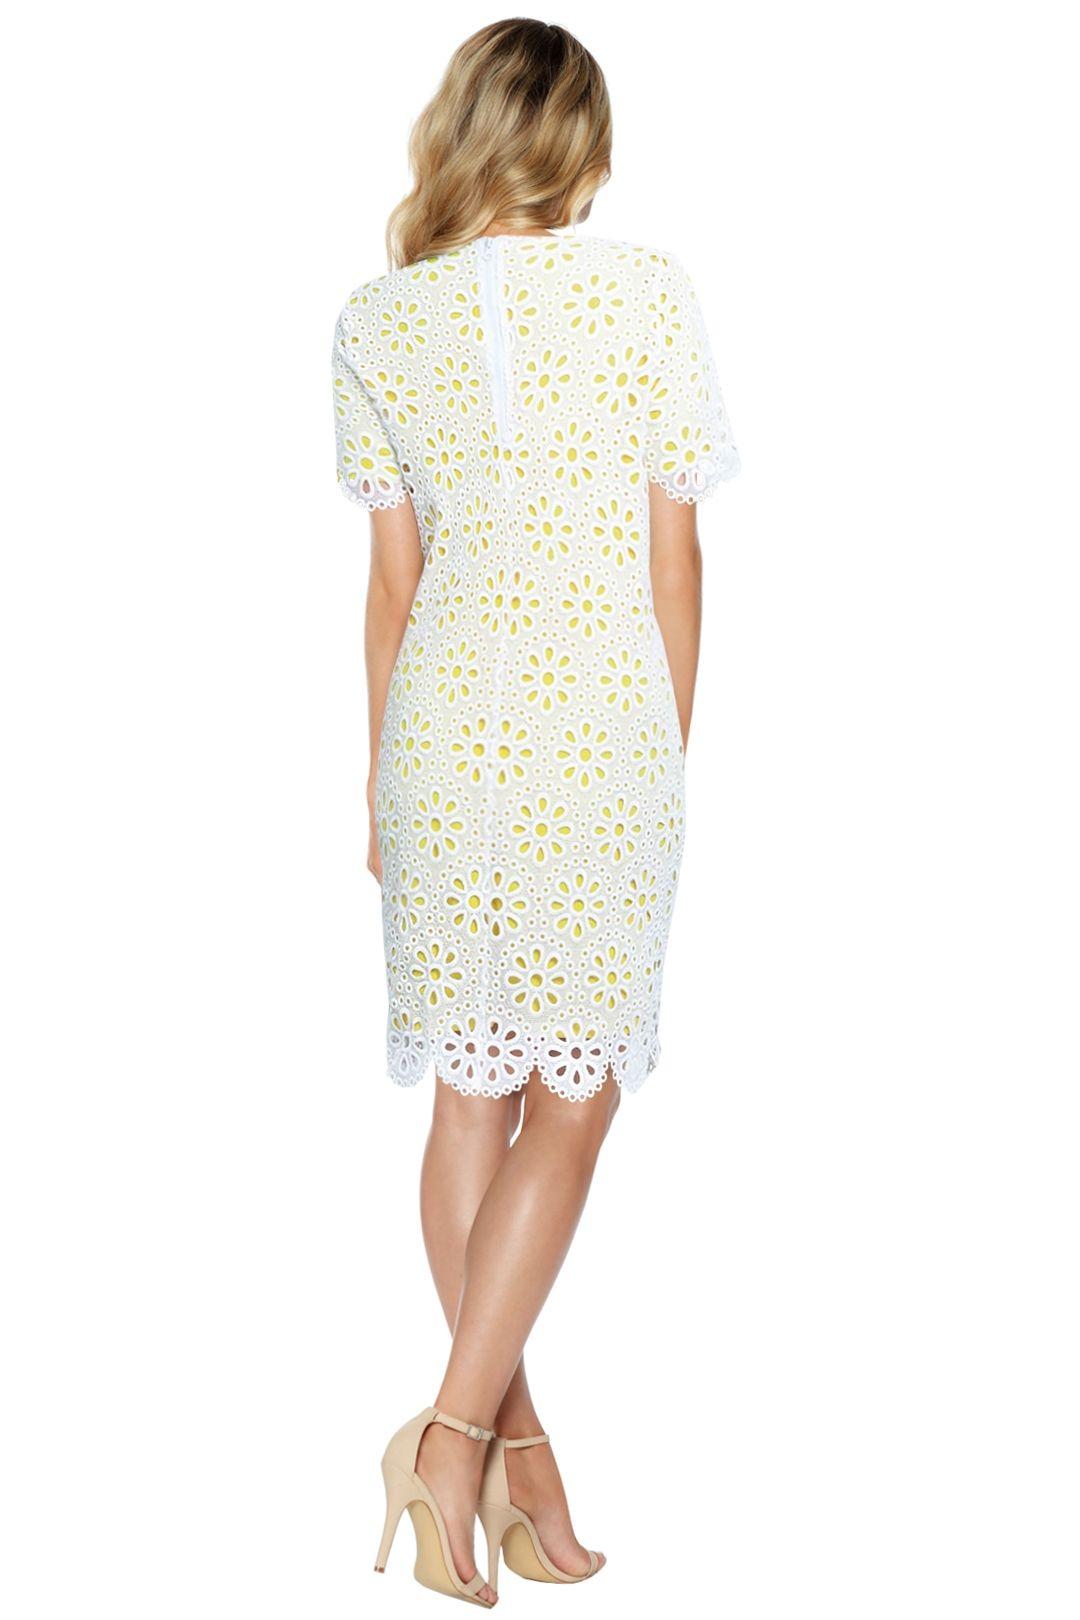 Anna Scholz - Daisy Lace Tunic Dress - White - Back